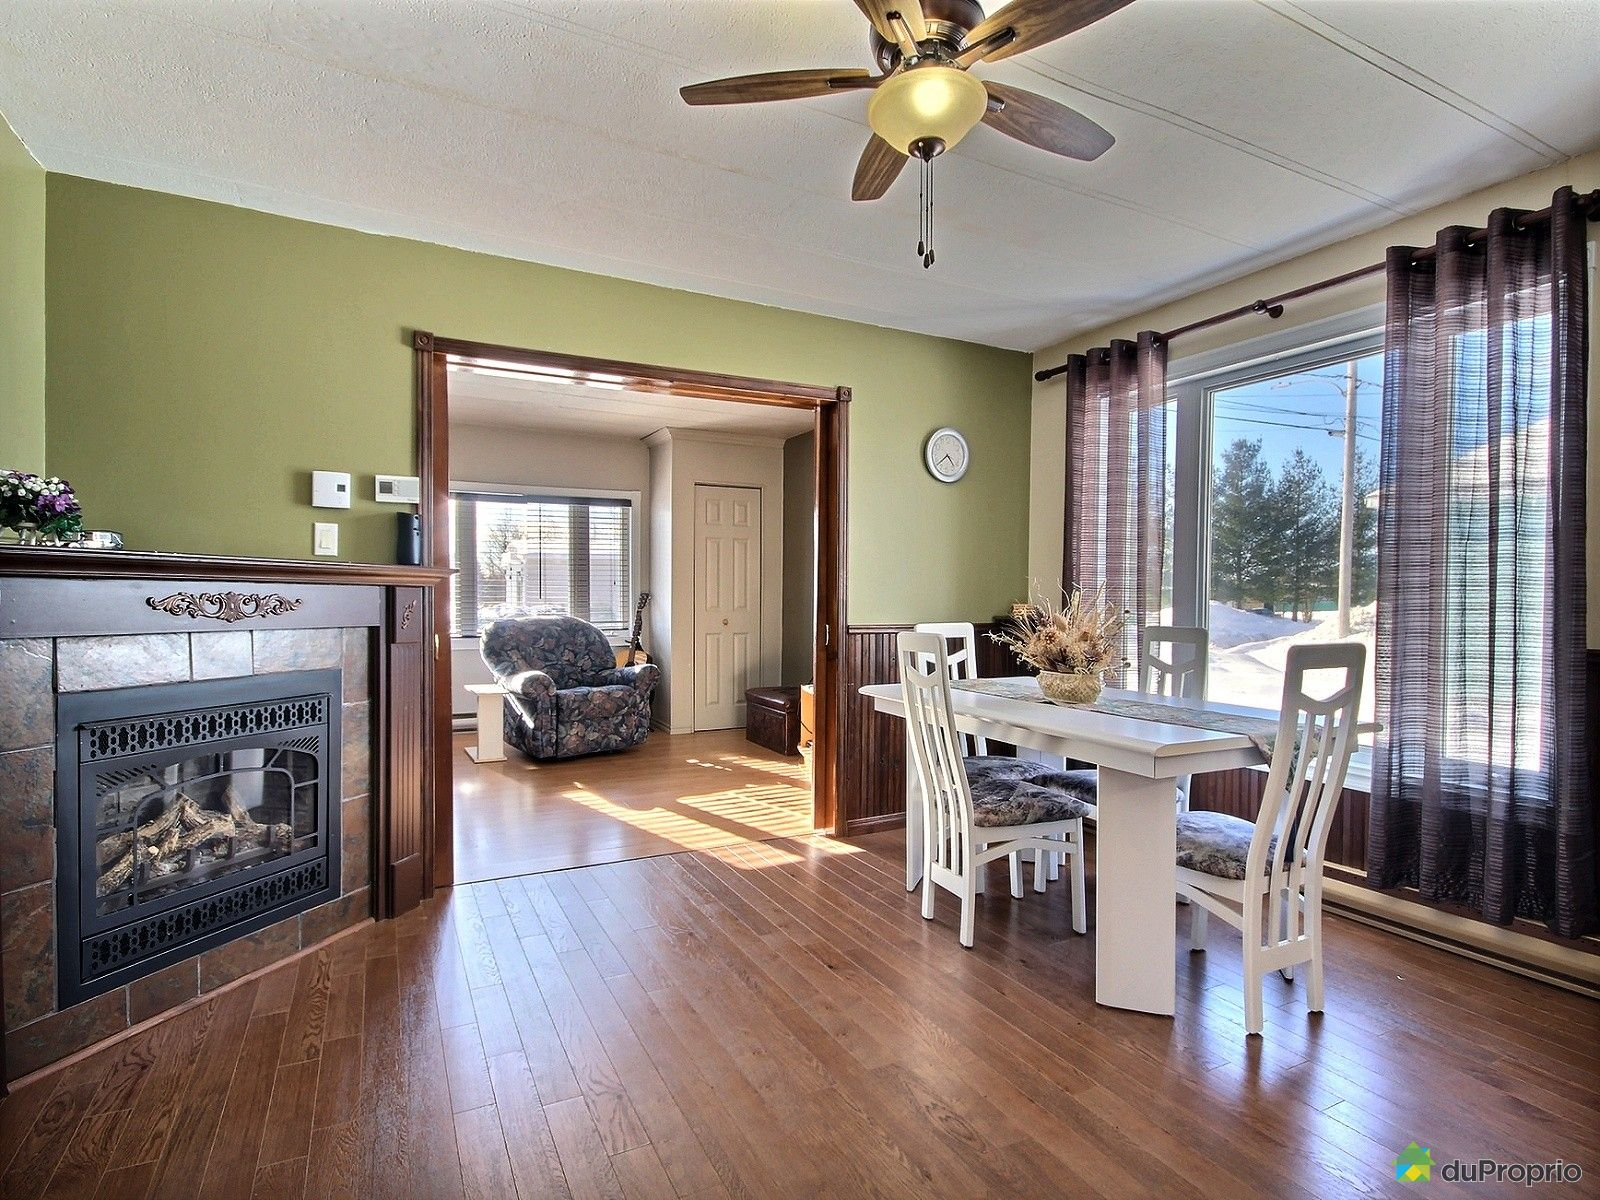 maison vendu st ambroise immobilier qu bec duproprio 686277. Black Bedroom Furniture Sets. Home Design Ideas